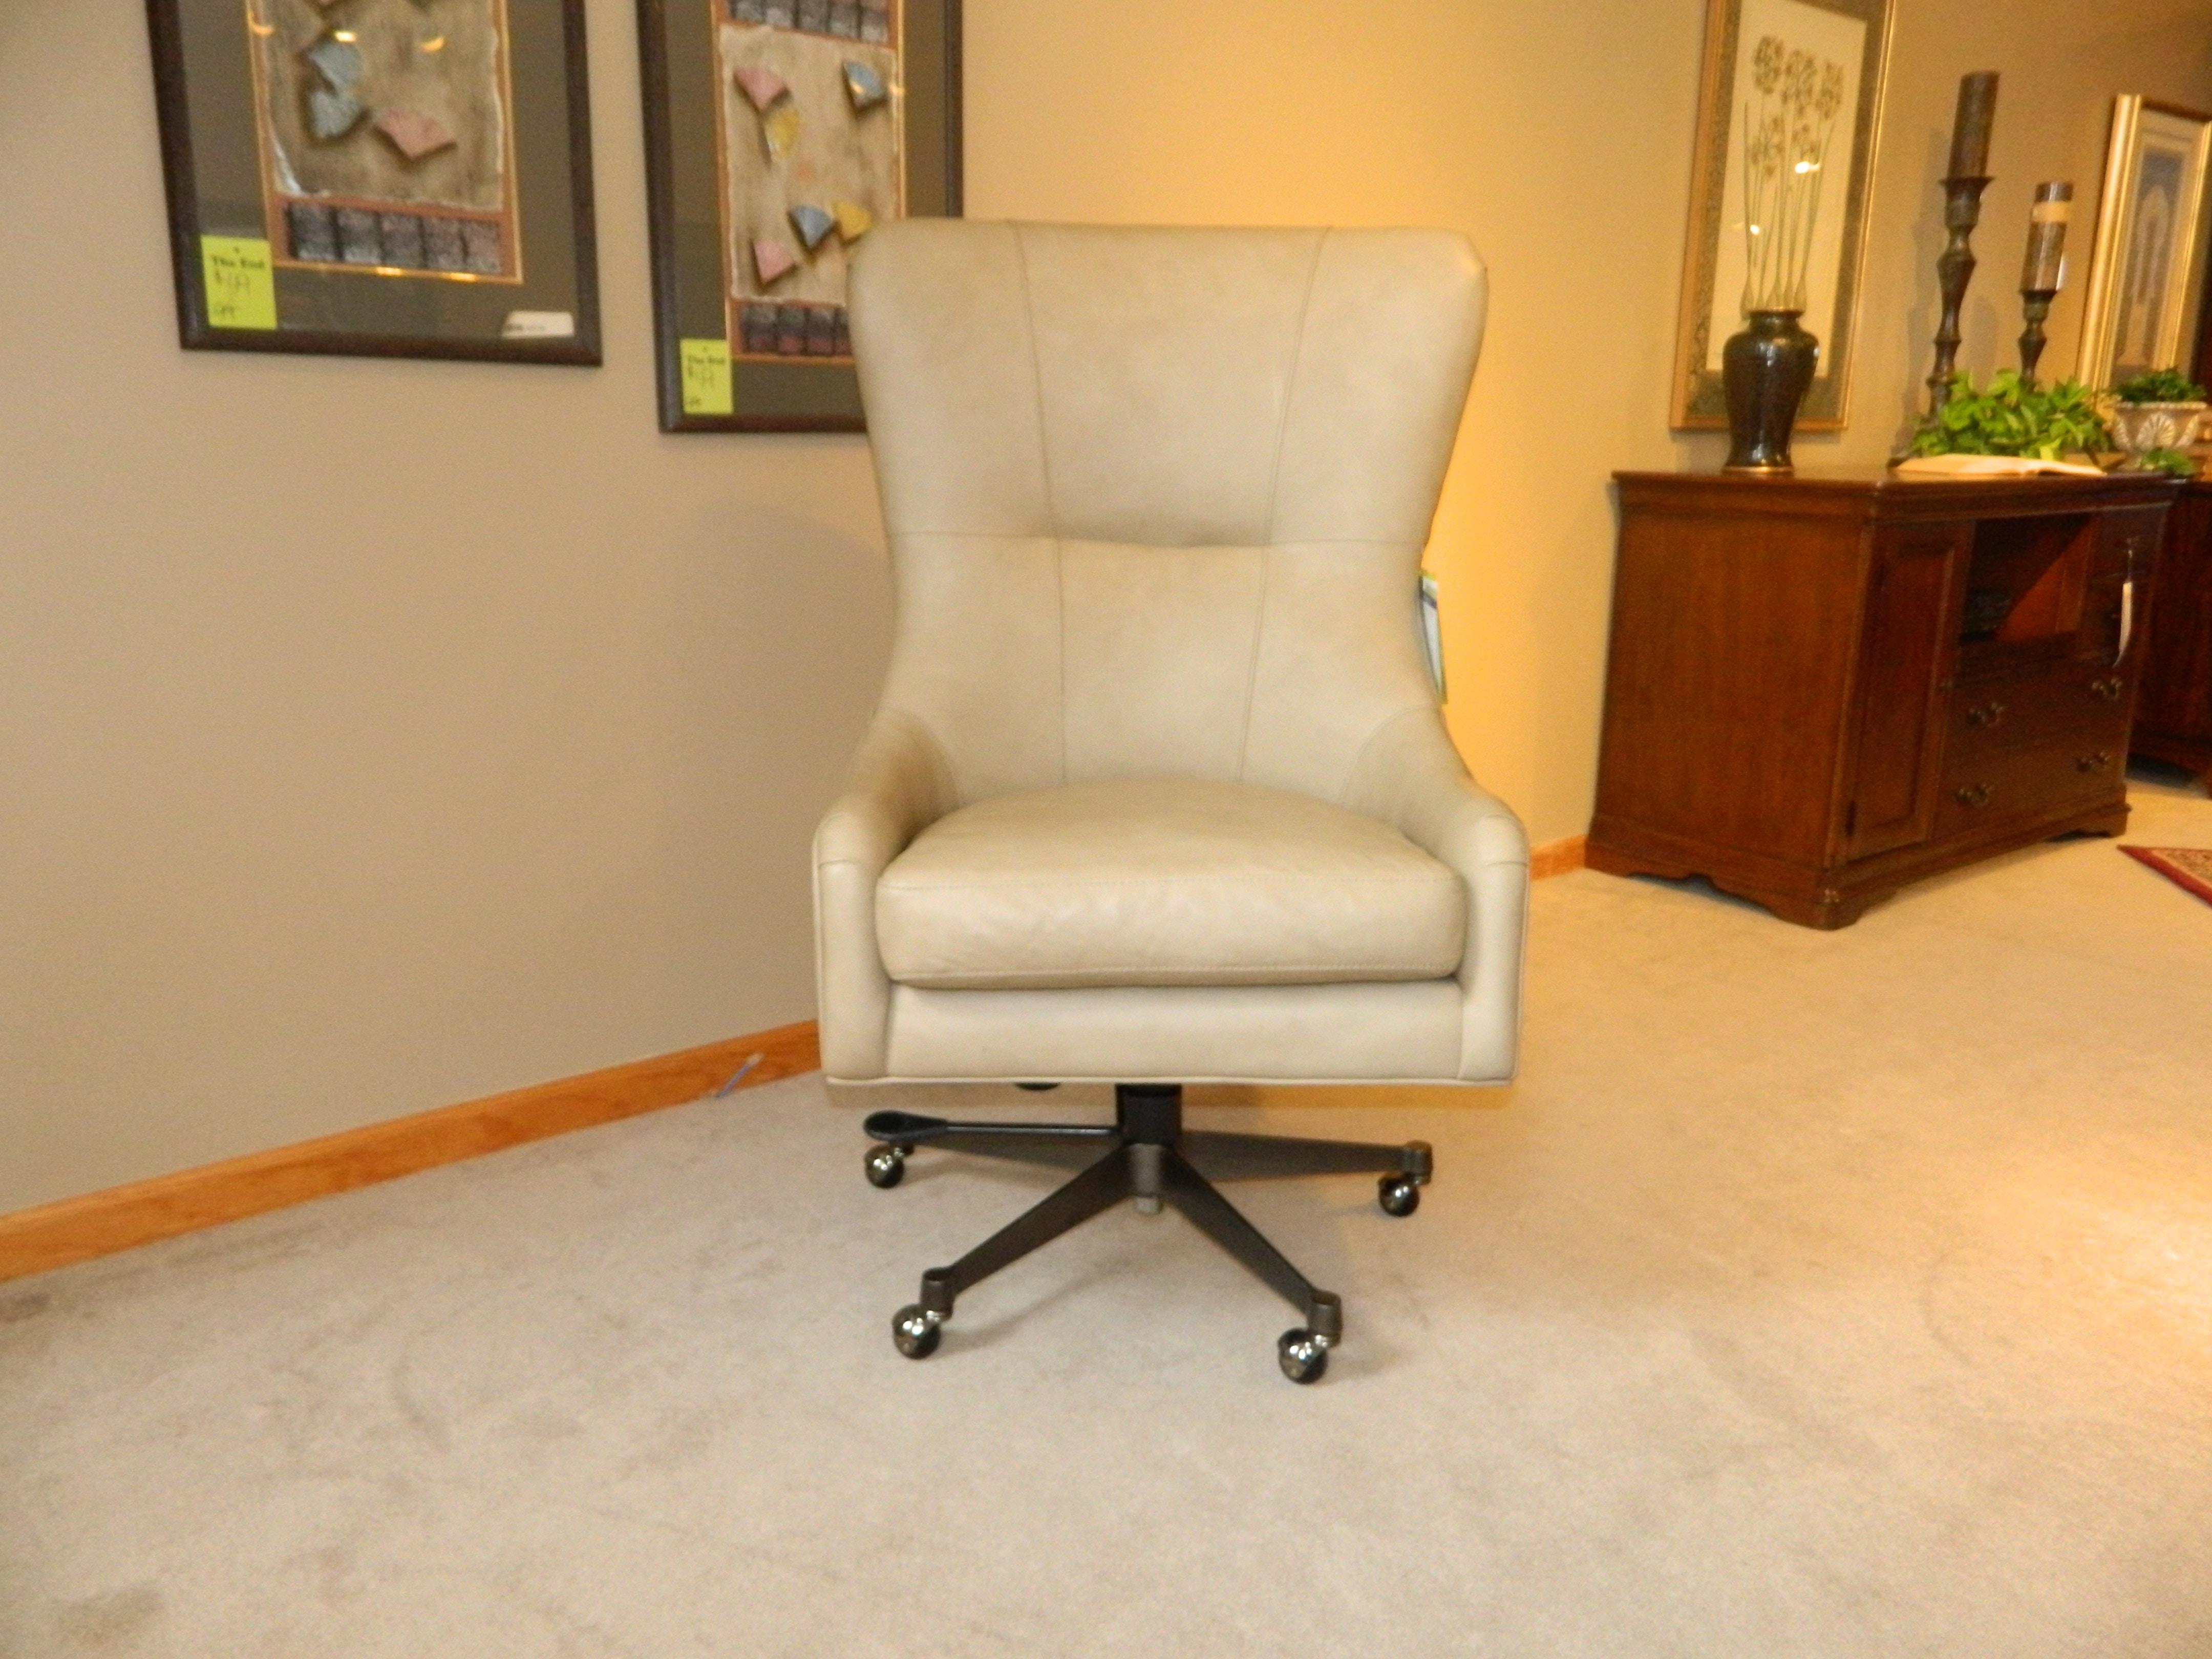 Goods Clearance Home Office FLEXSTEEL OFFICE CHAIR FSW670883